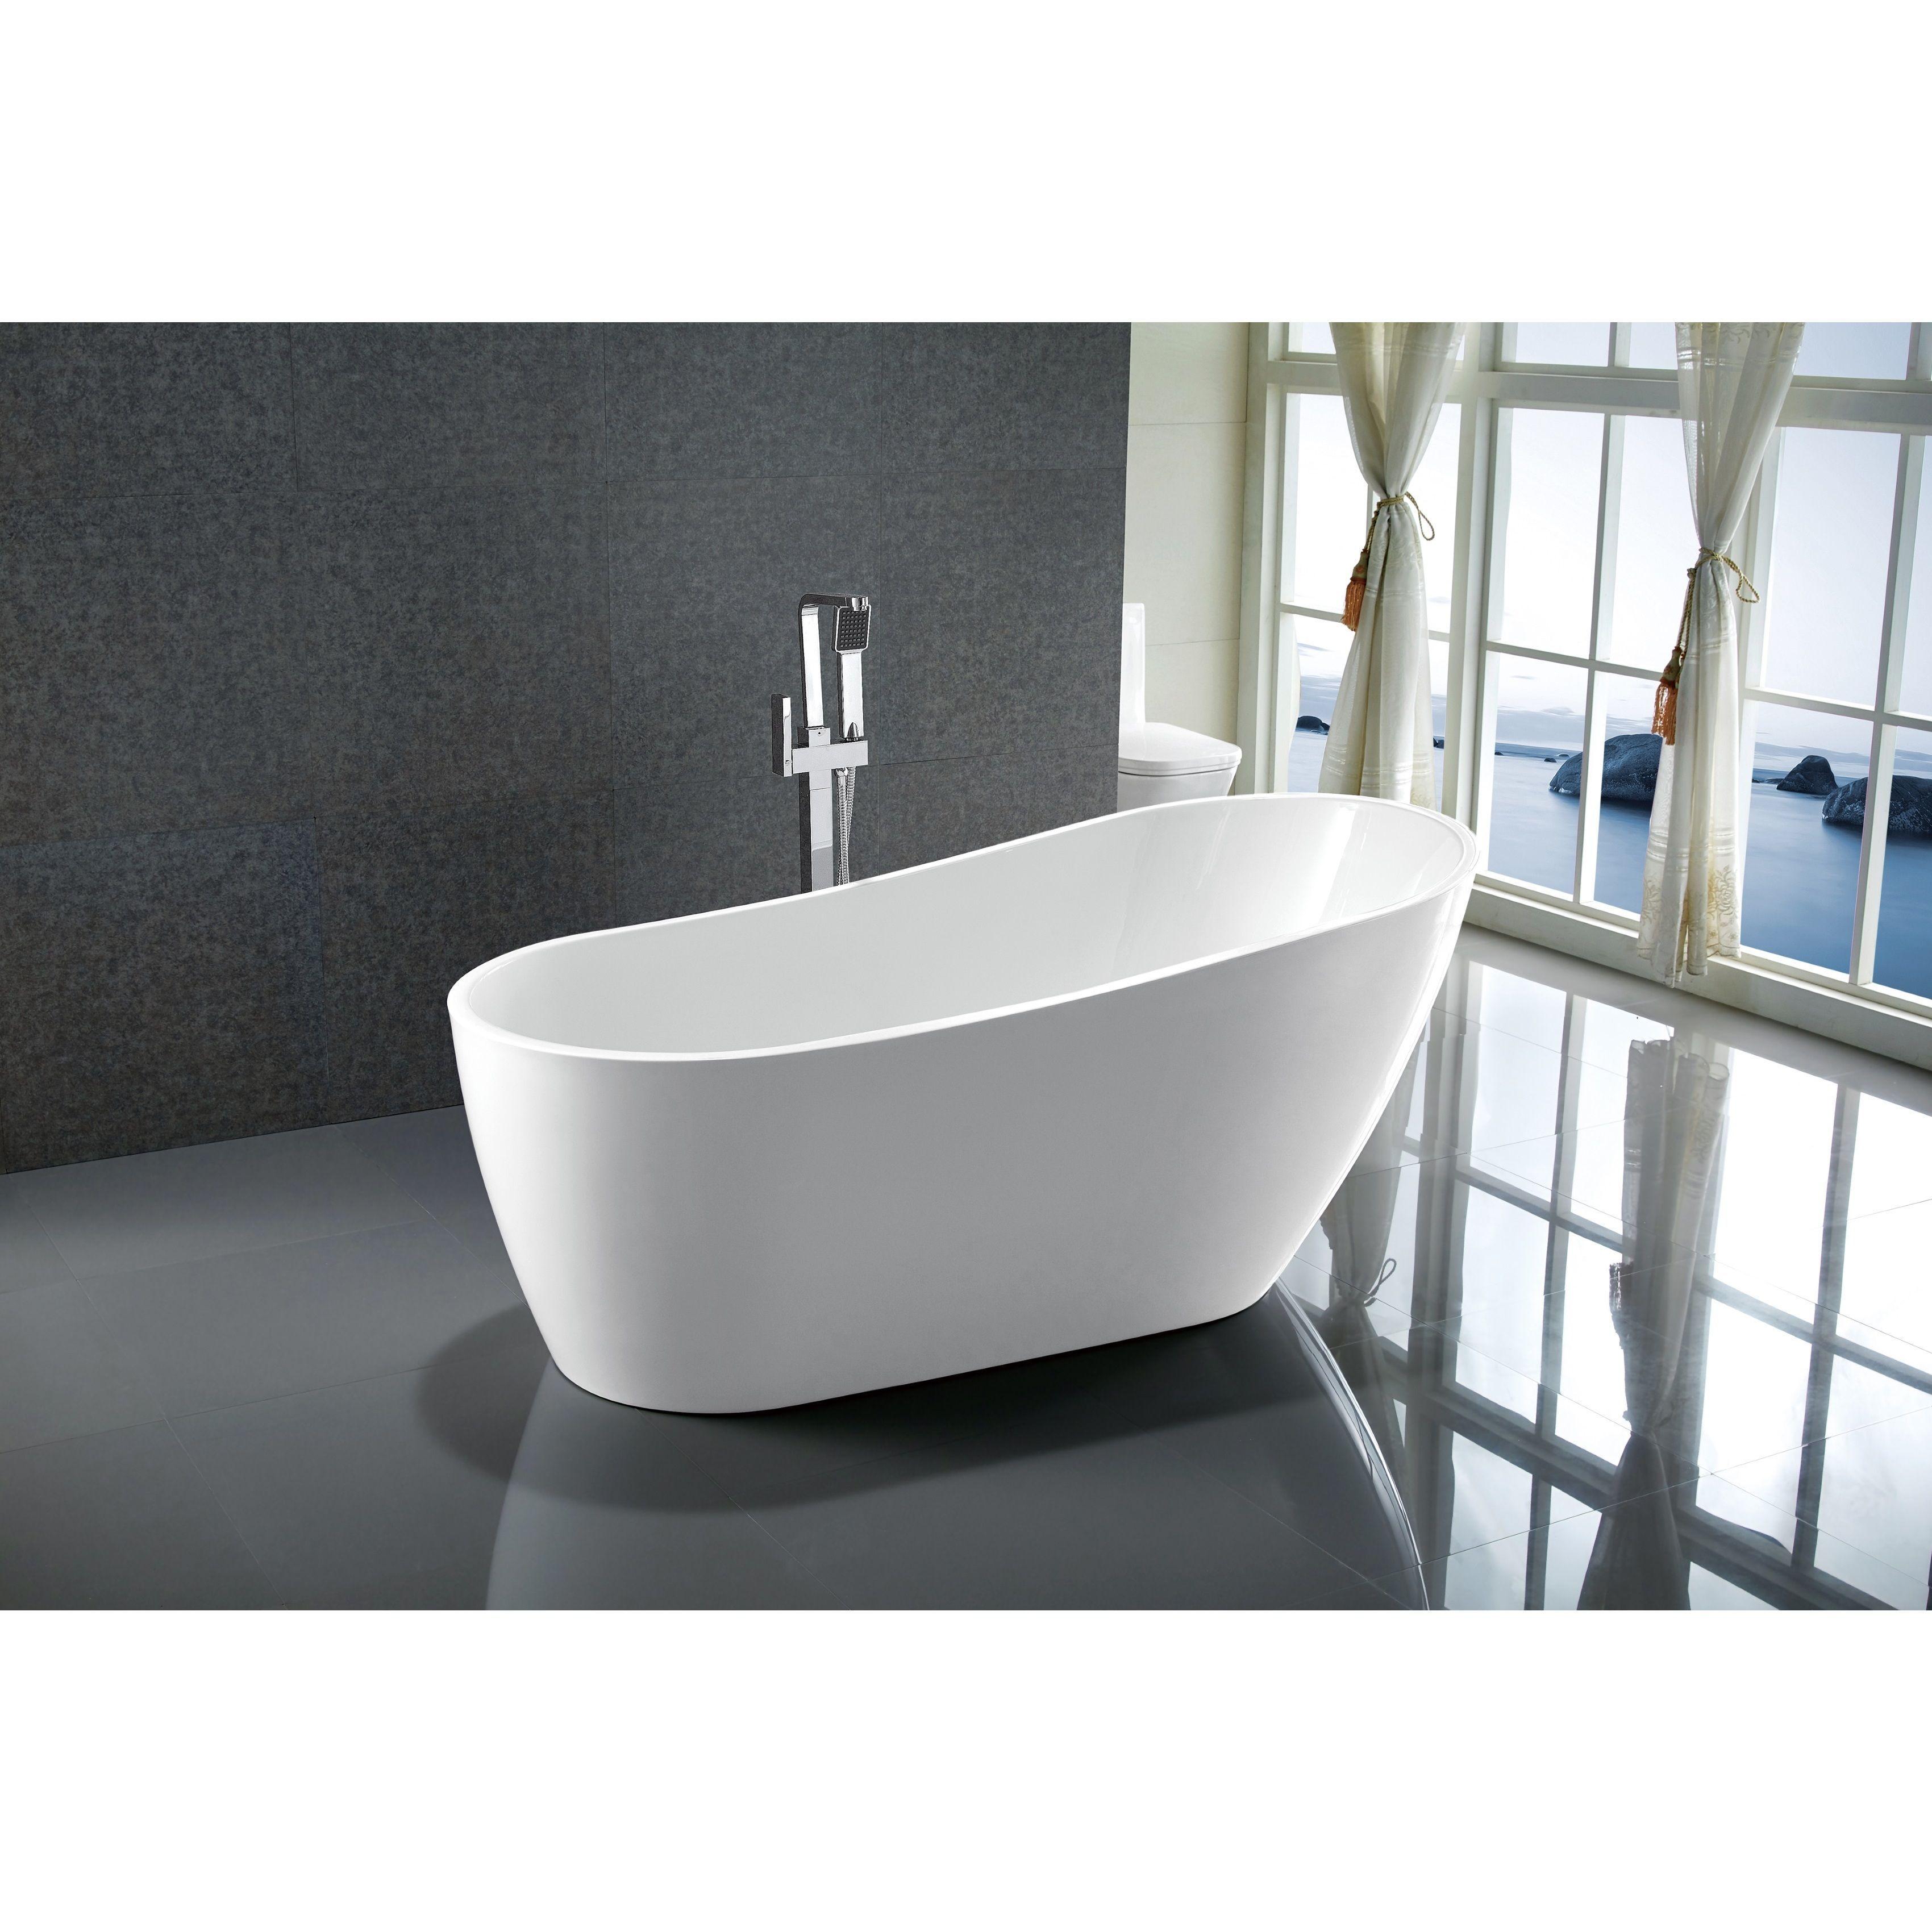 Vanity Art 67 Freestanding Acrylic Bathtub Stand Alone Soaking